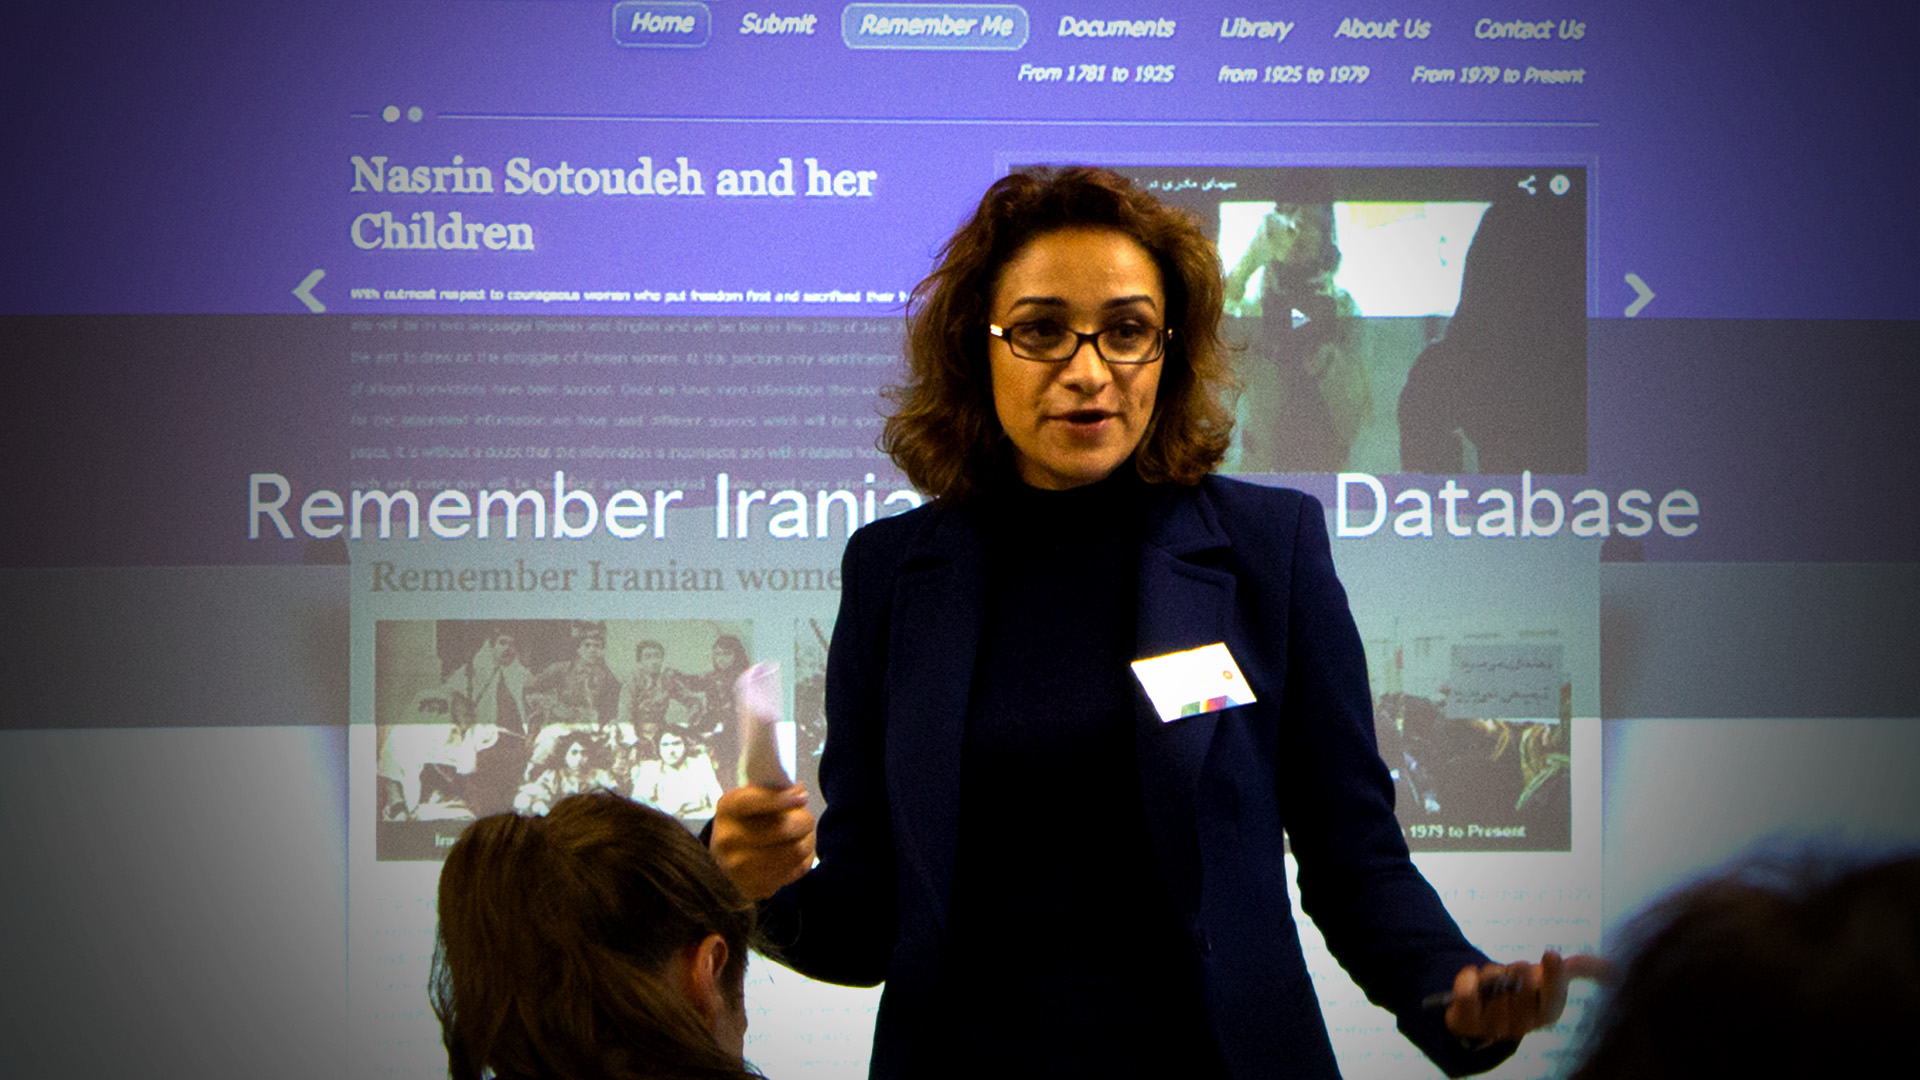 remember iranian women intro.jpg